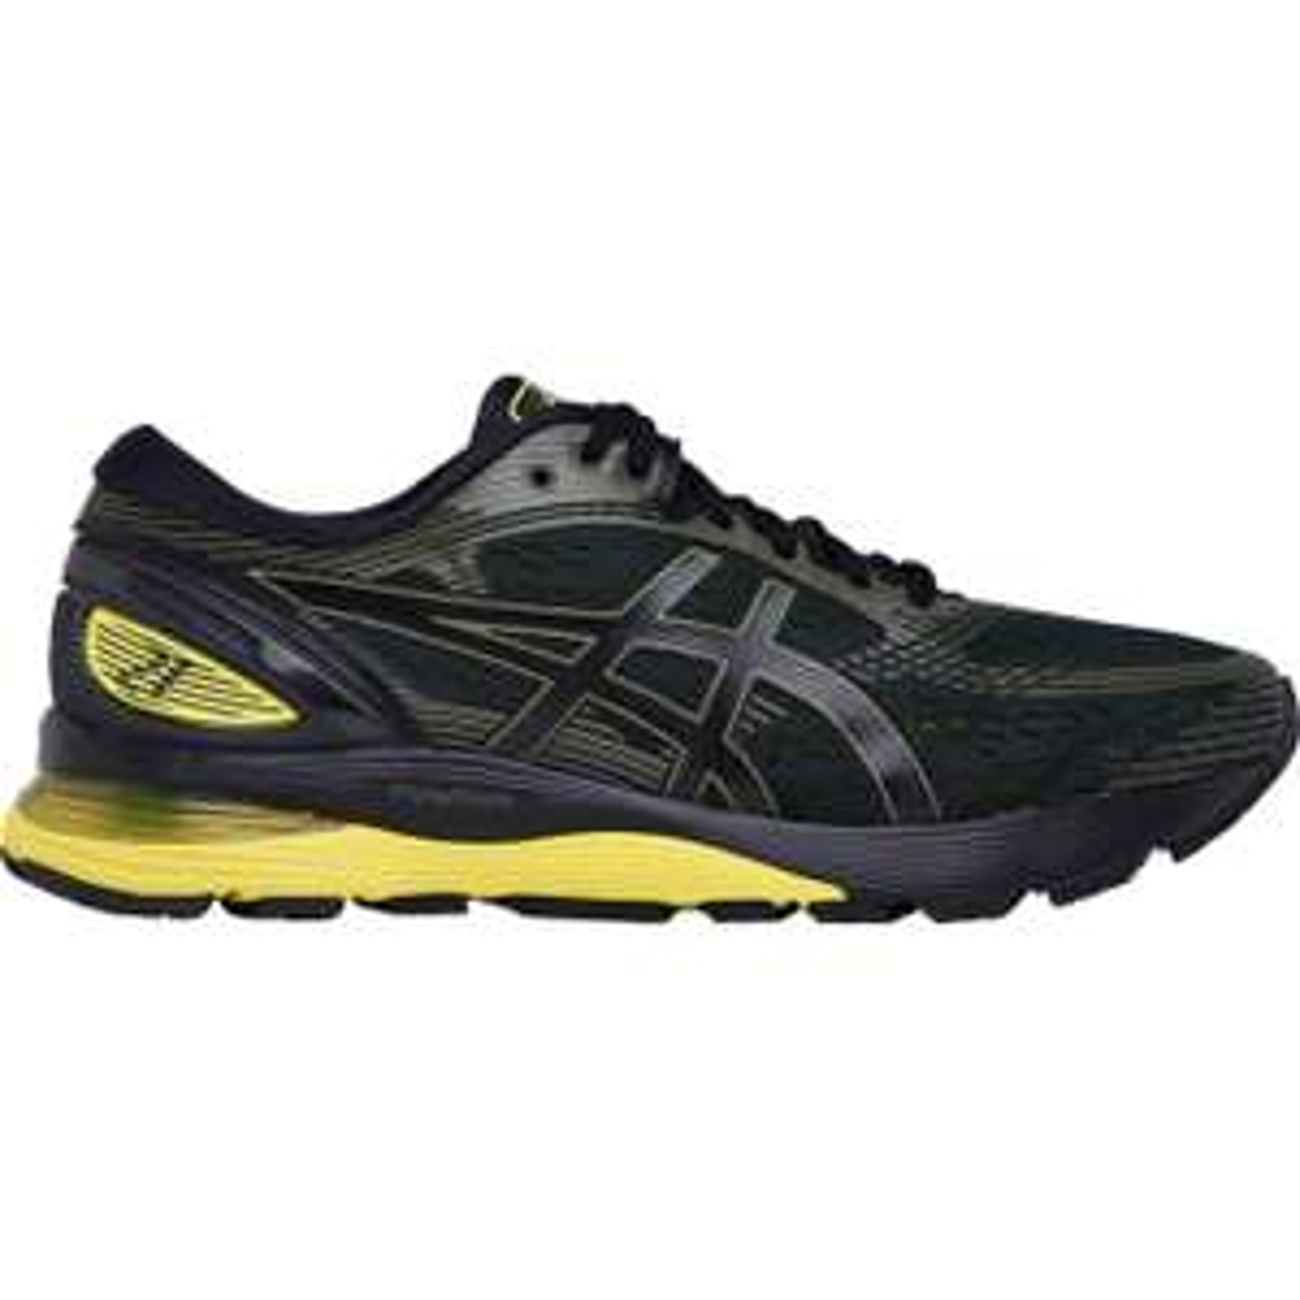 Chaussures Running Homme Asics Nimbus 21 (plusieurs tailles)